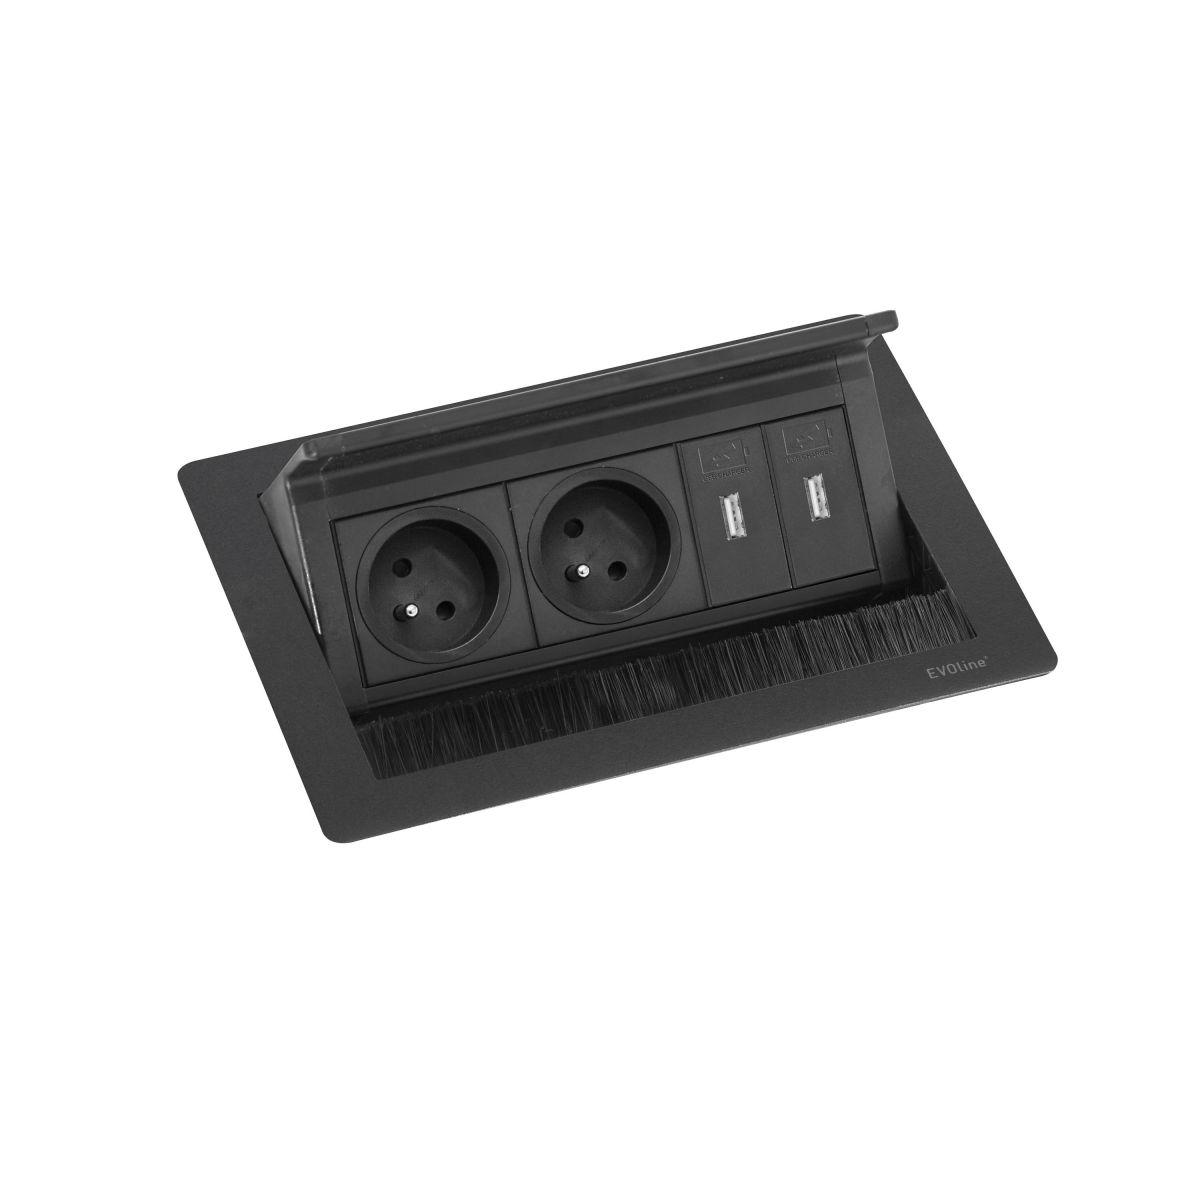 fliptop push small 2st2usb stopcontact